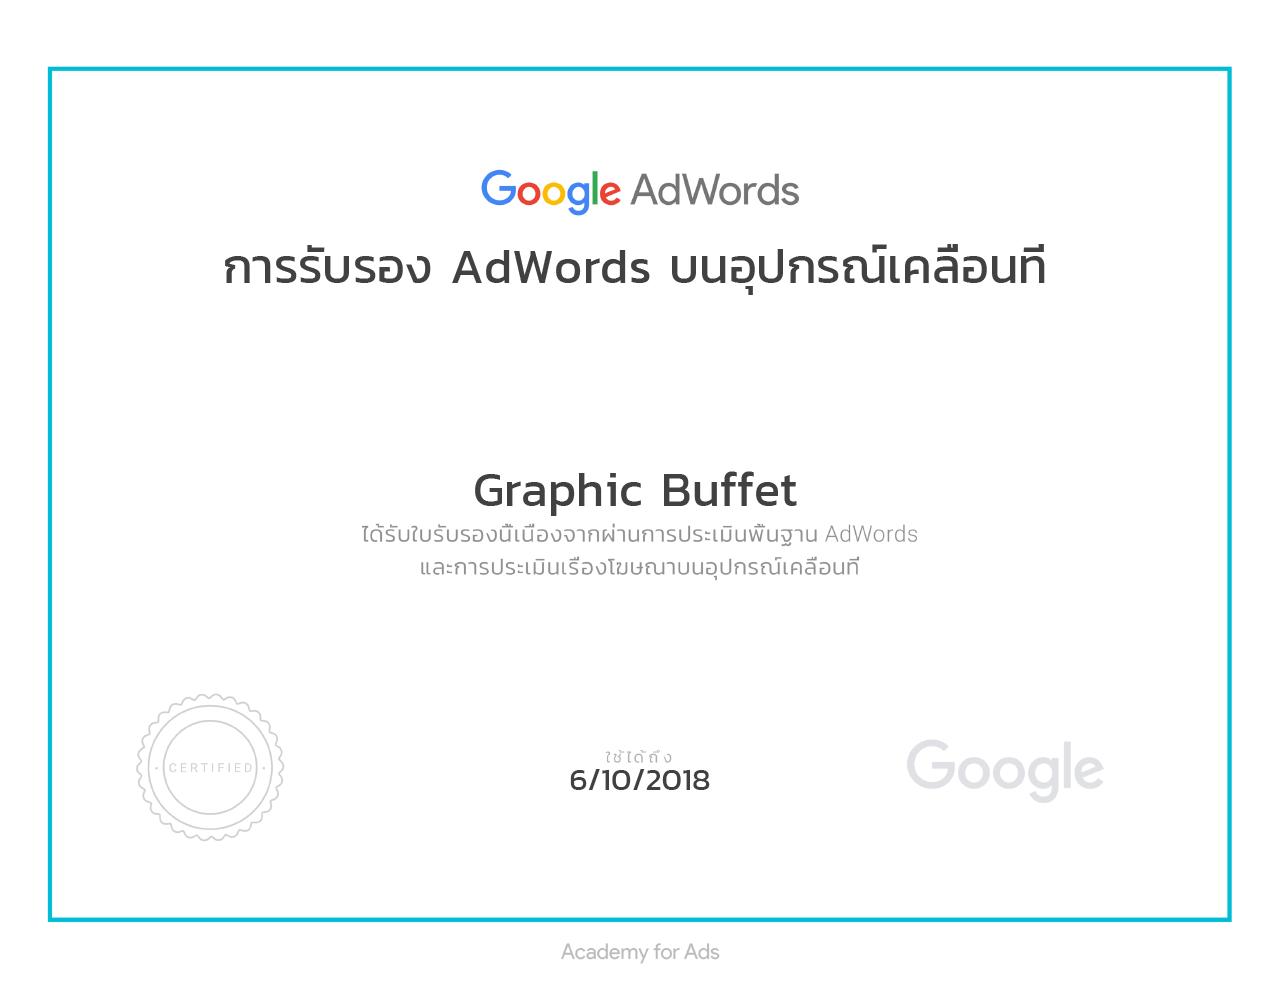 certificate 03584 6832678 รับทำ Google Adwords